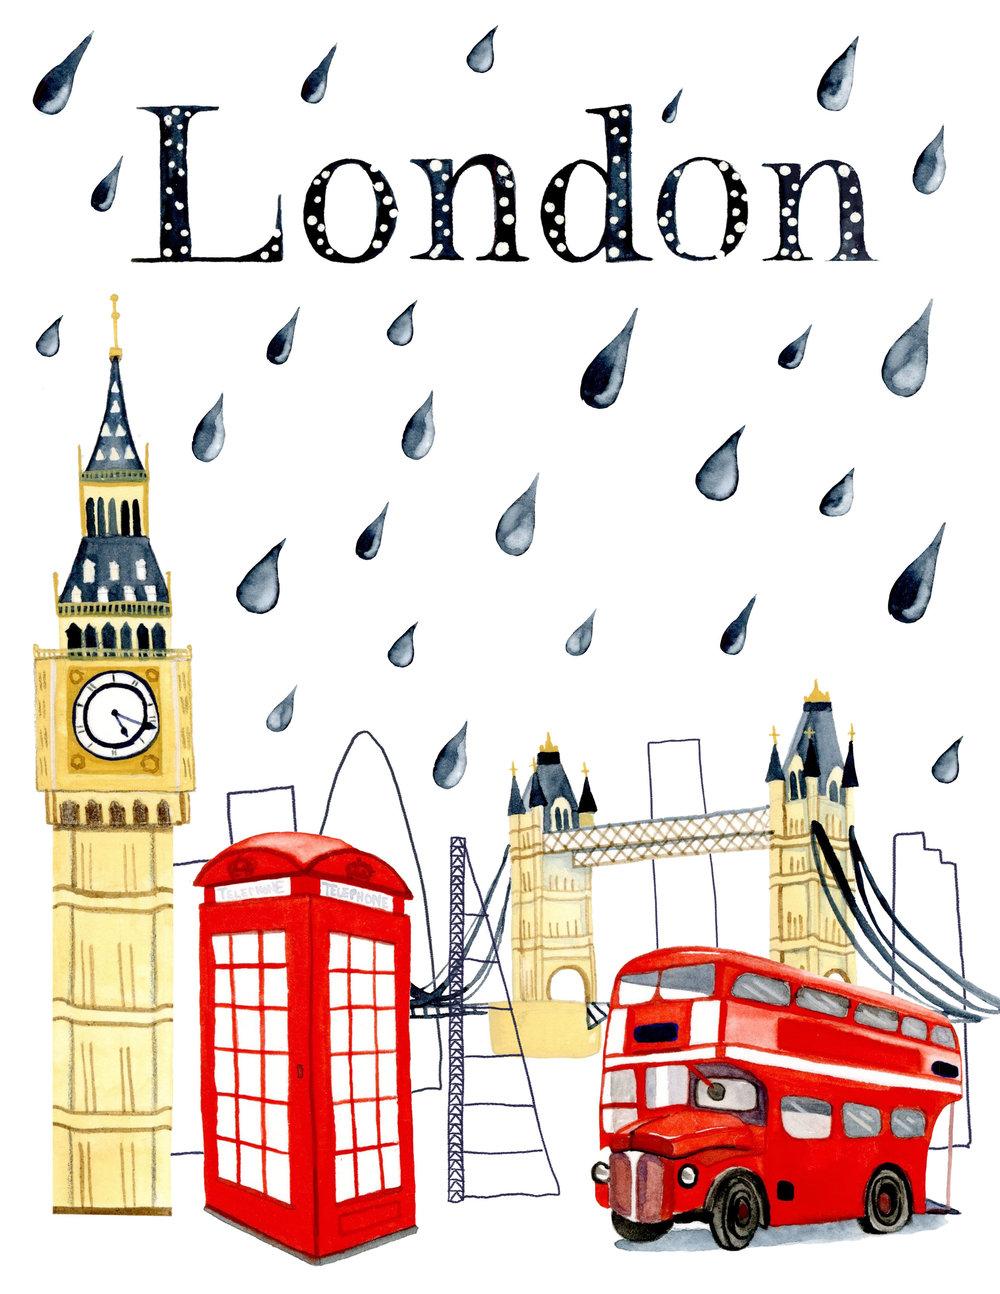 London Poster/Editorial Illustration